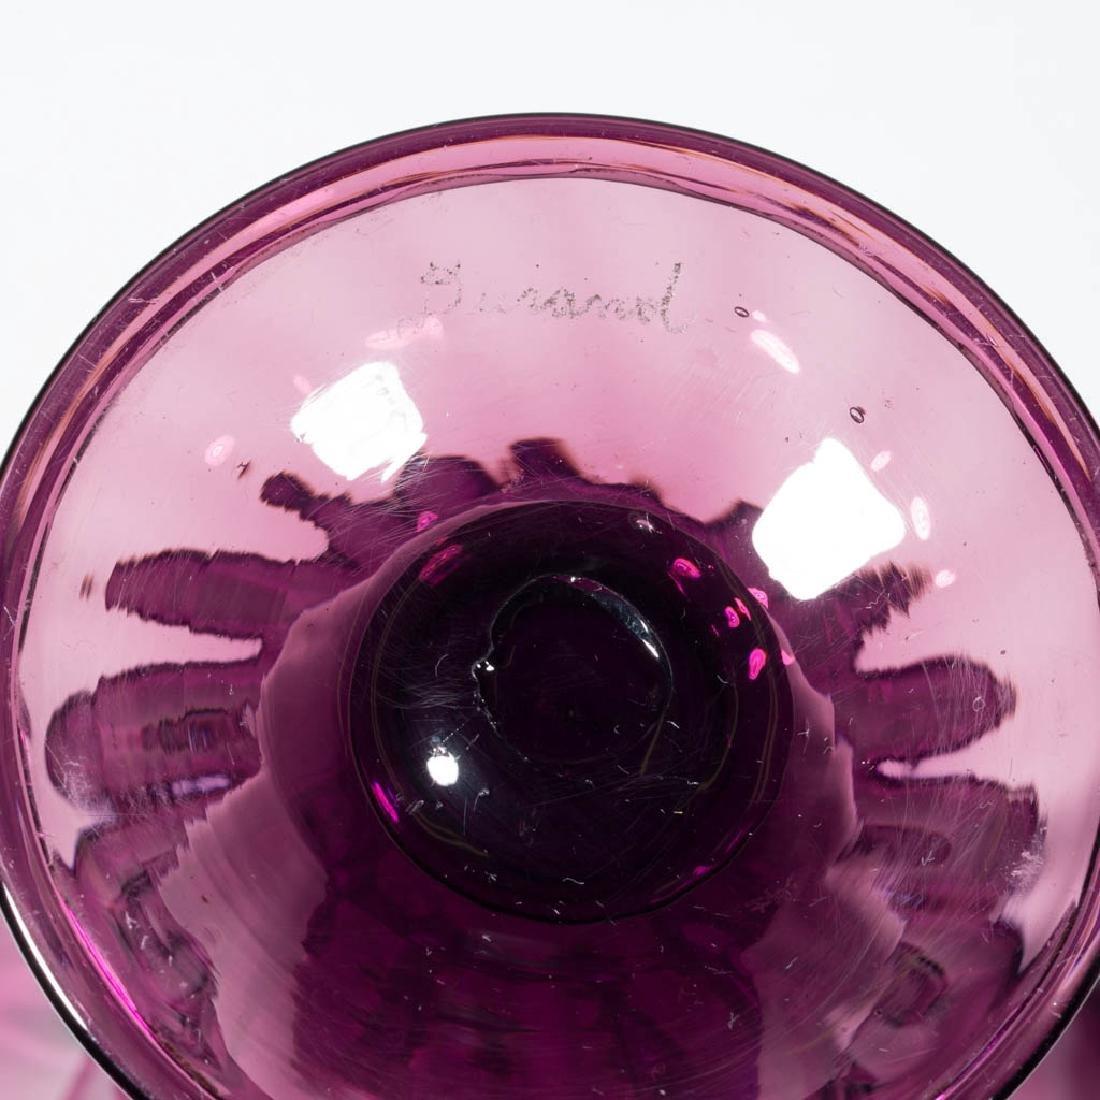 STEUBEN RIBBED-OPTIC ART GLASS TRUMPET VASE - 2